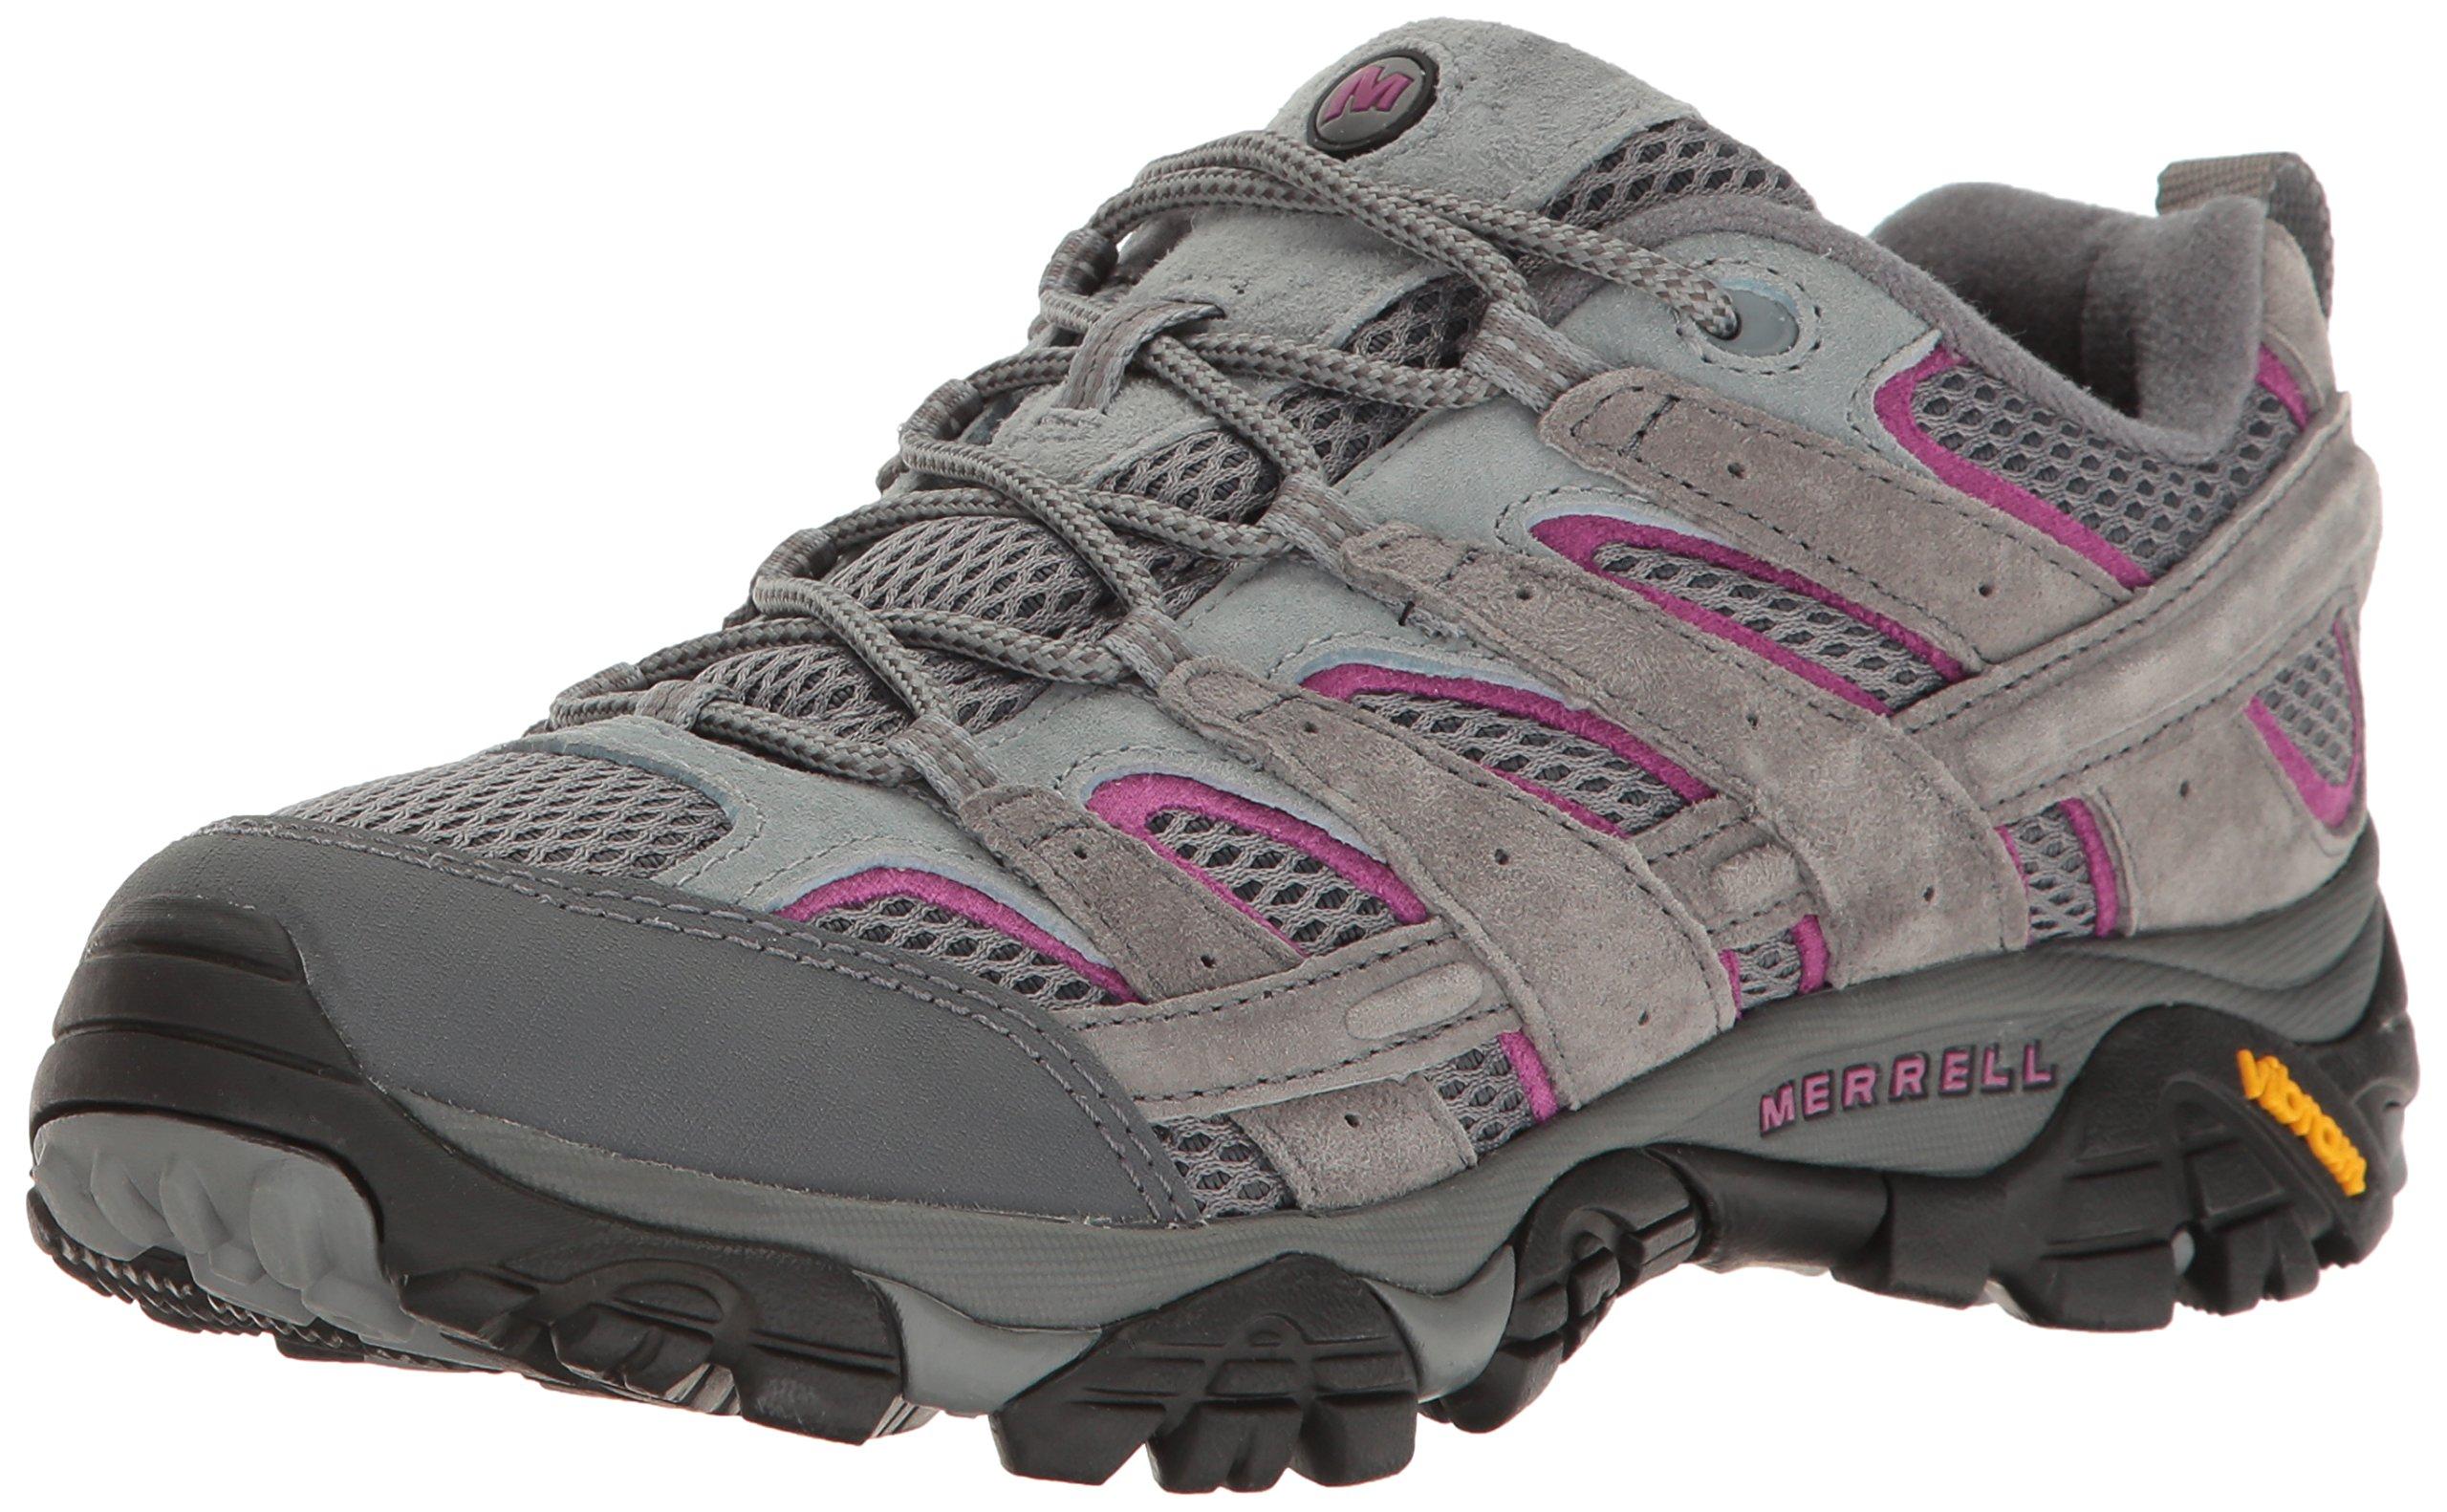 Merrell Women's Moab 2 Vent Hiking Shoe, Castle Rock, 5 M US